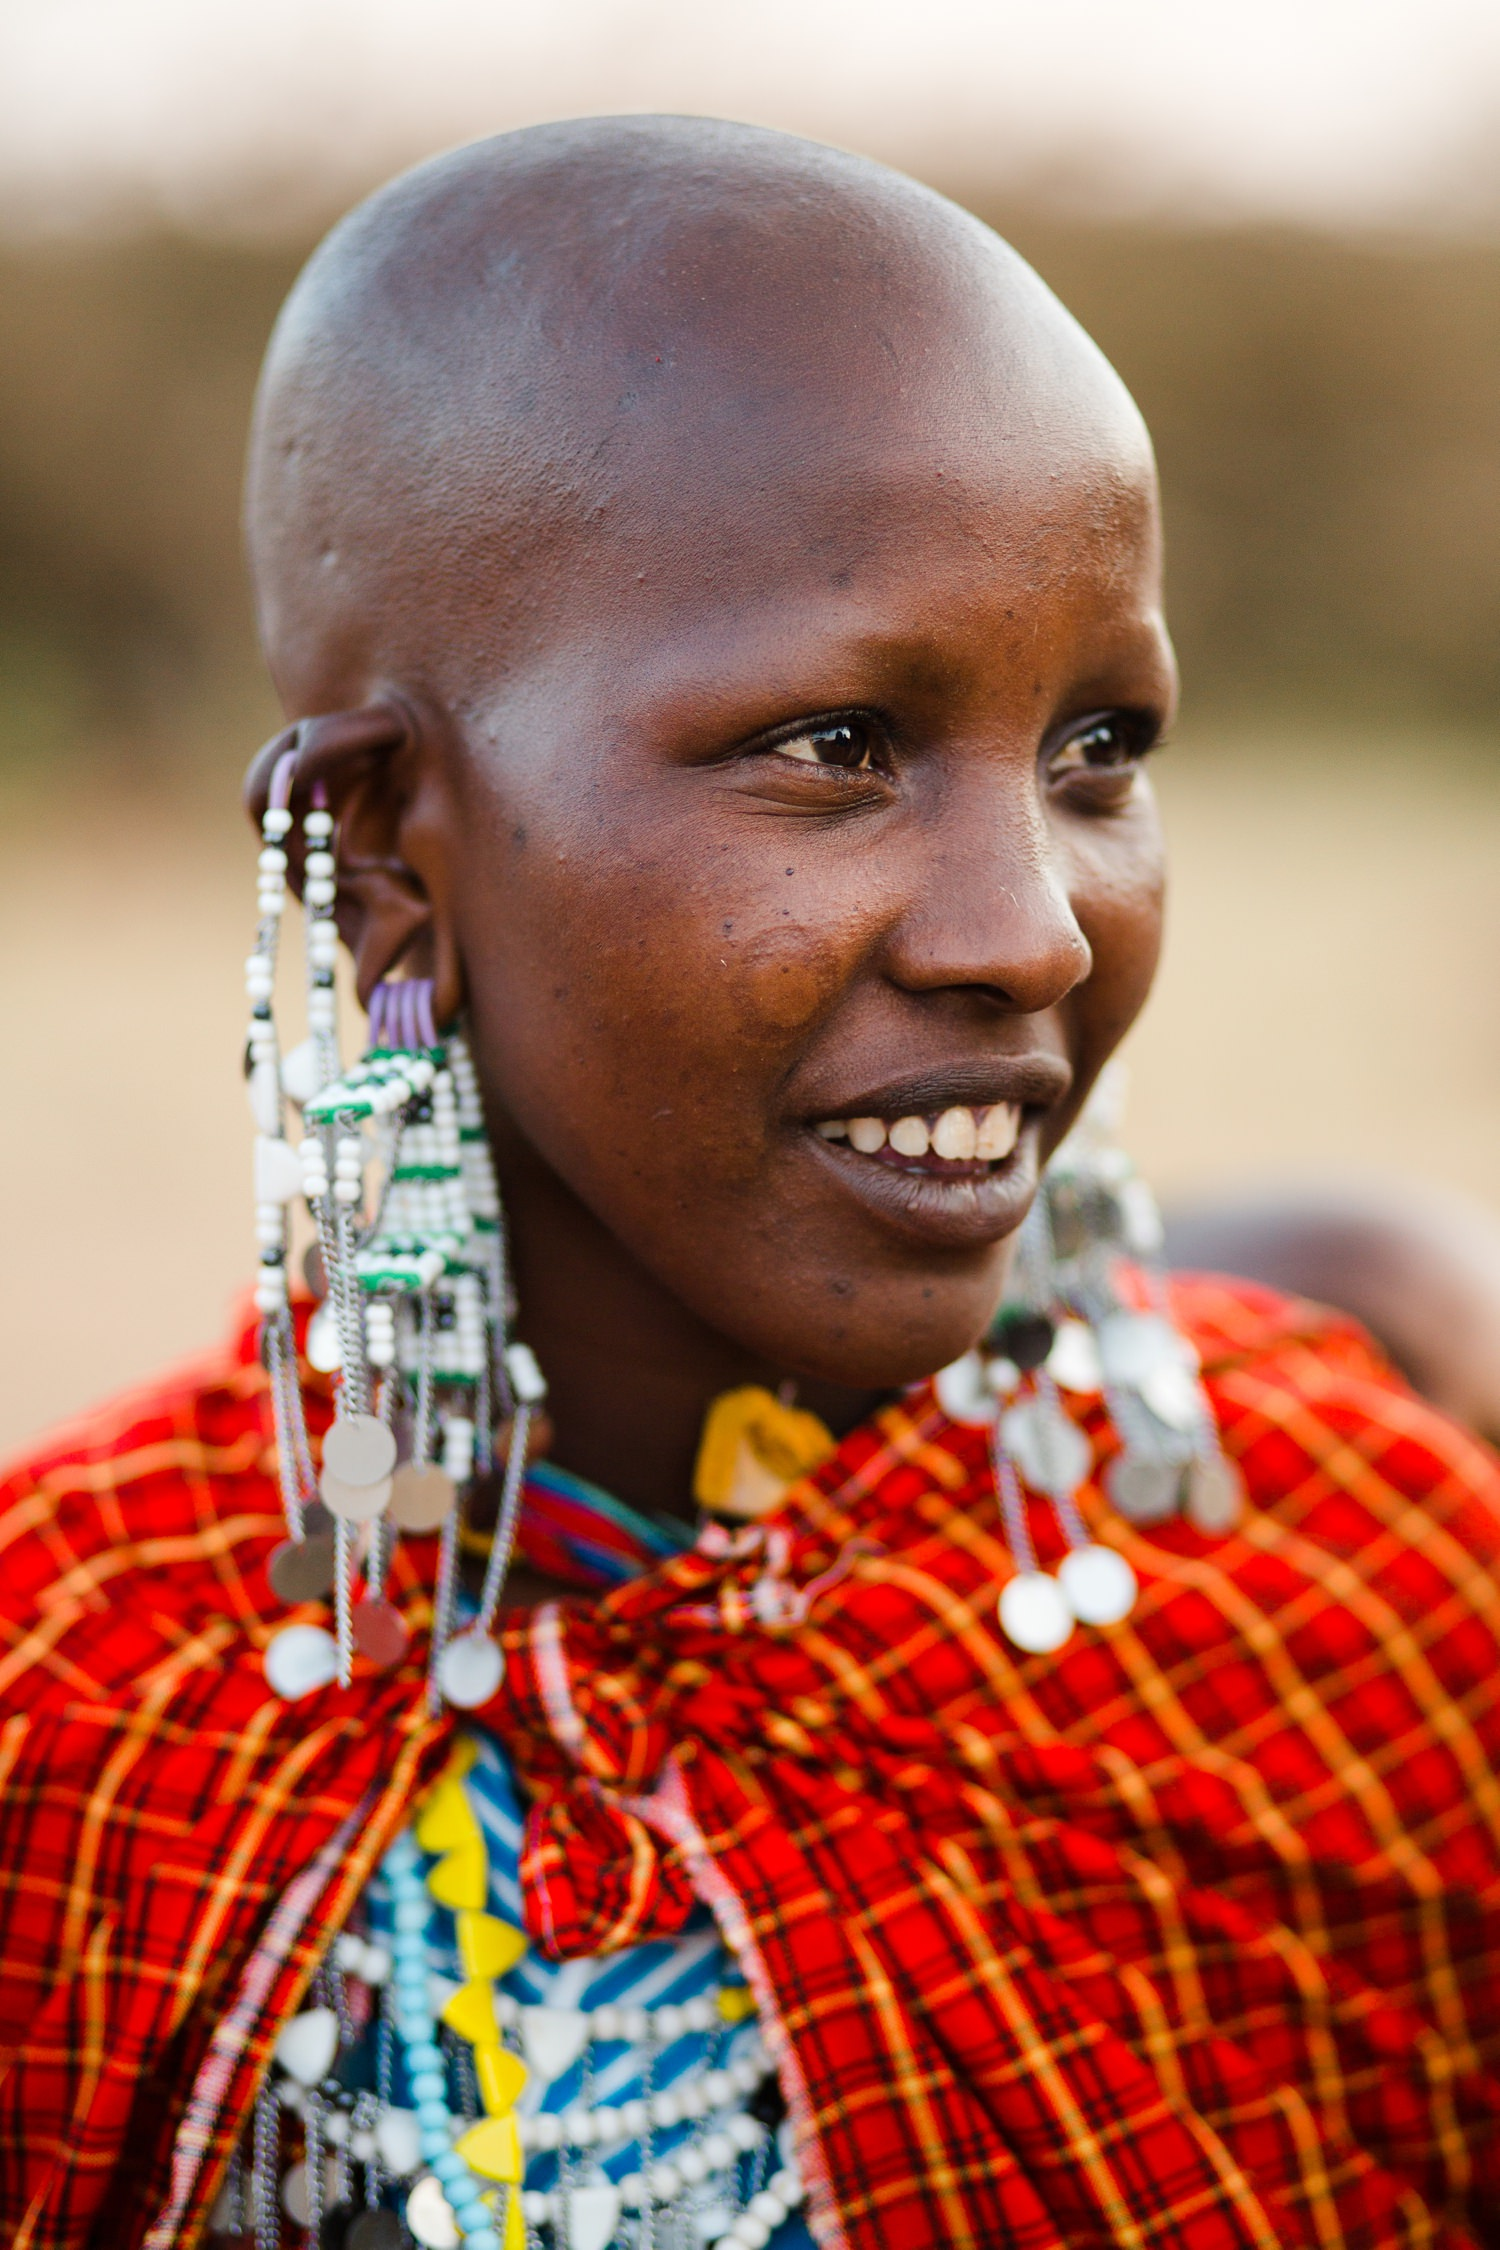 cameron-zegers-travel-photographer-tanzania-seattle-editorial-culture.jpg